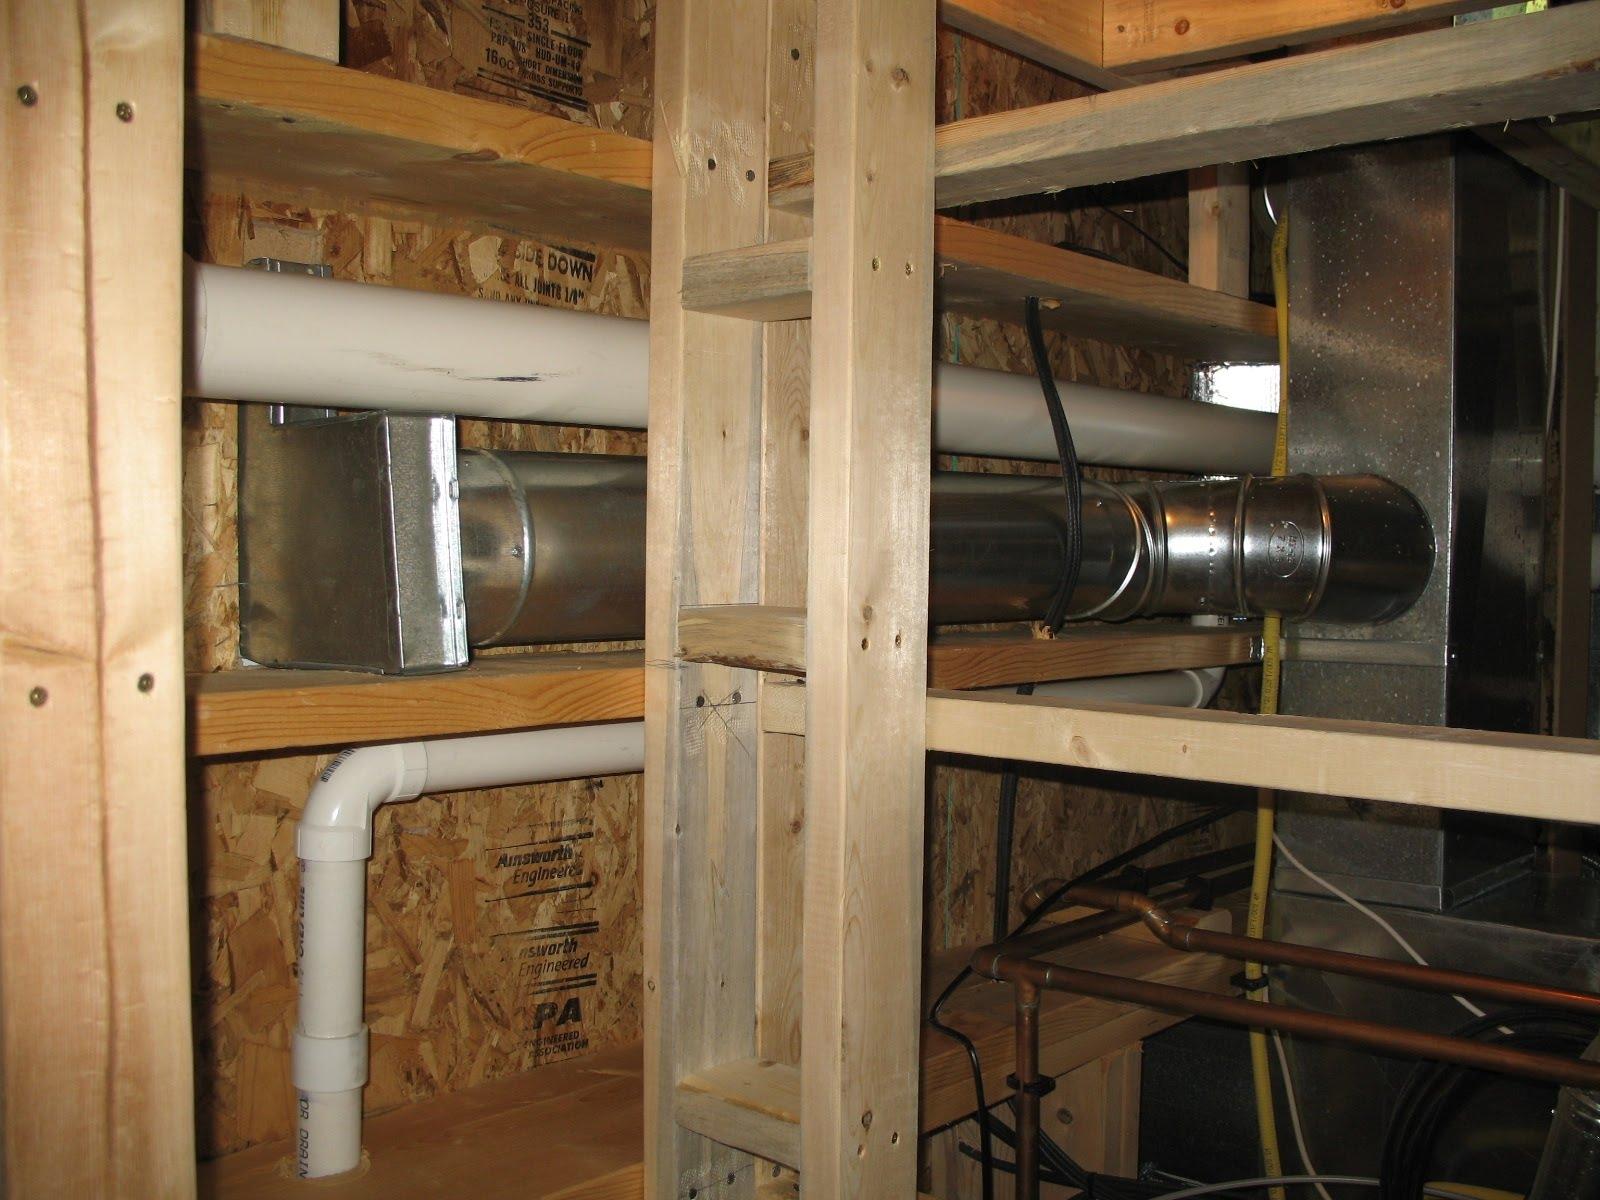 Ventilation Fan For Basement Bathroom